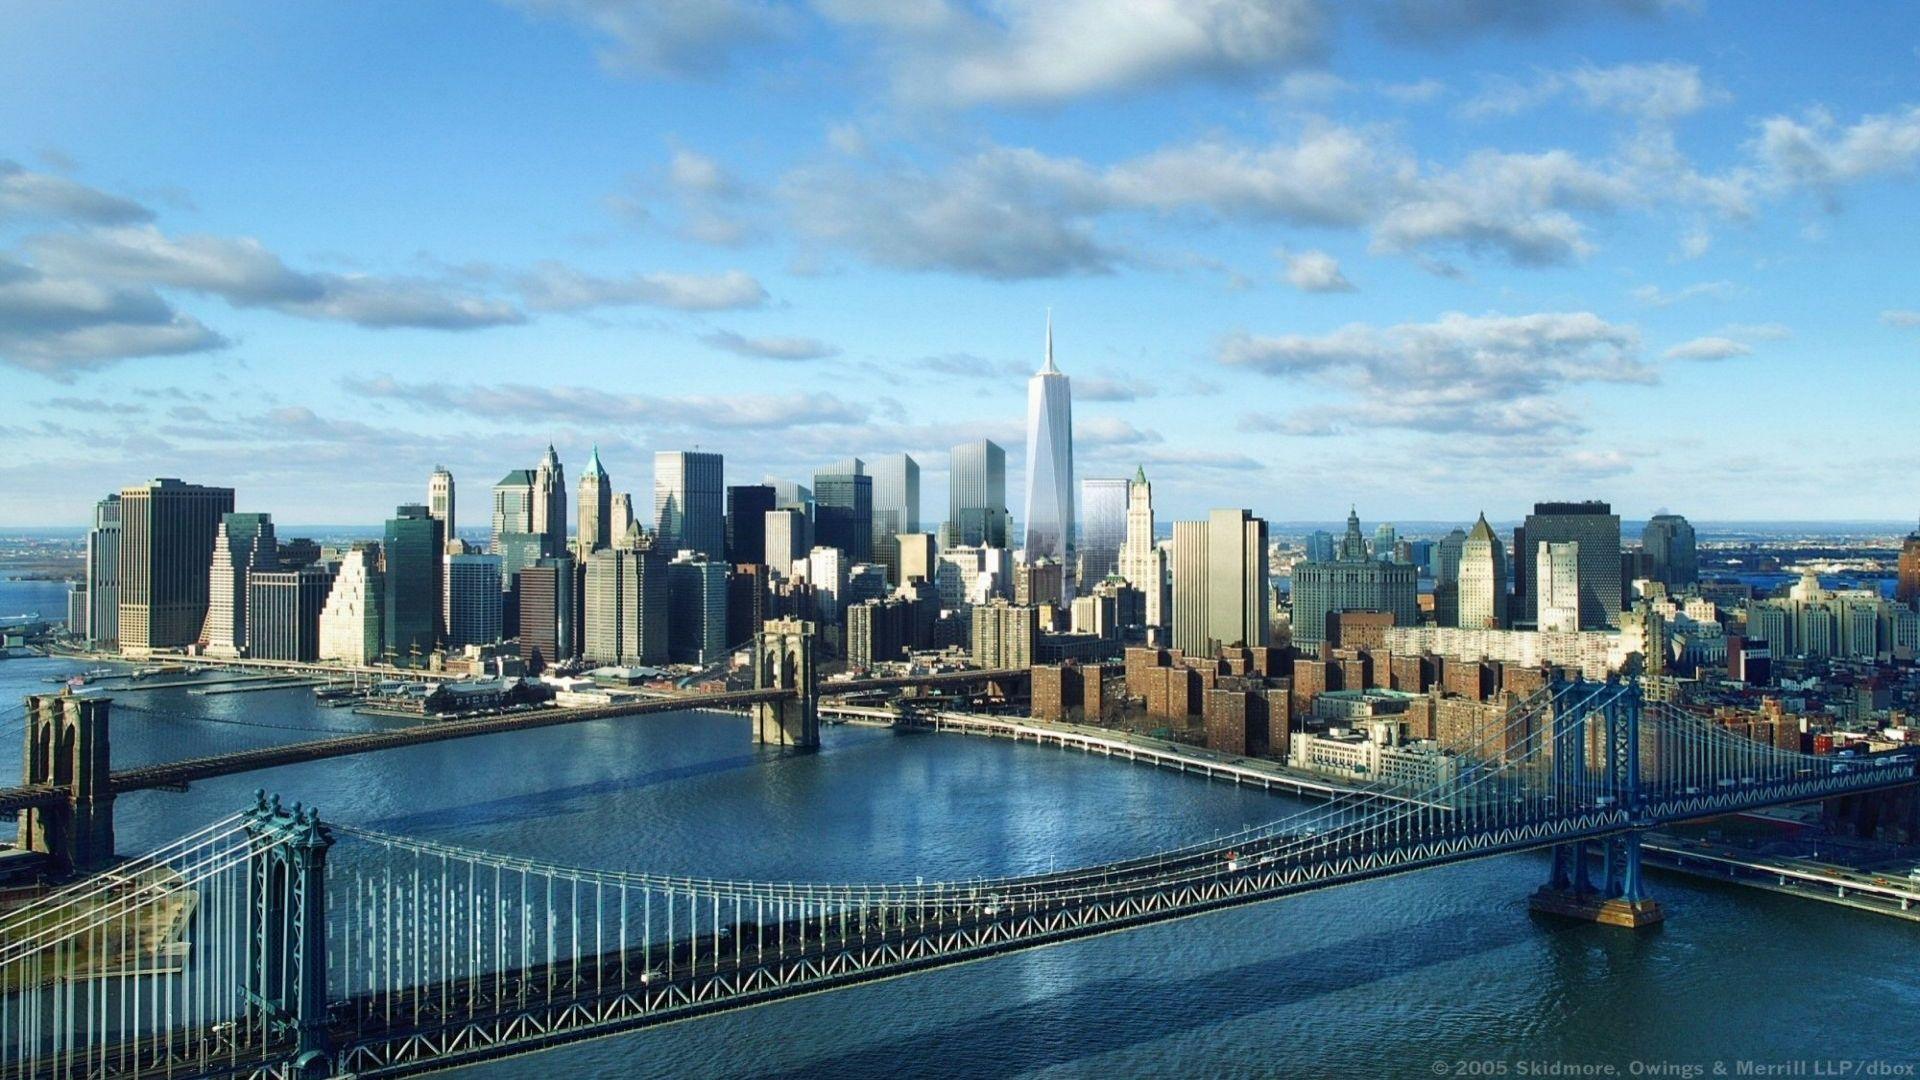 New York 1080p Wallpapers Wallpaper Cave